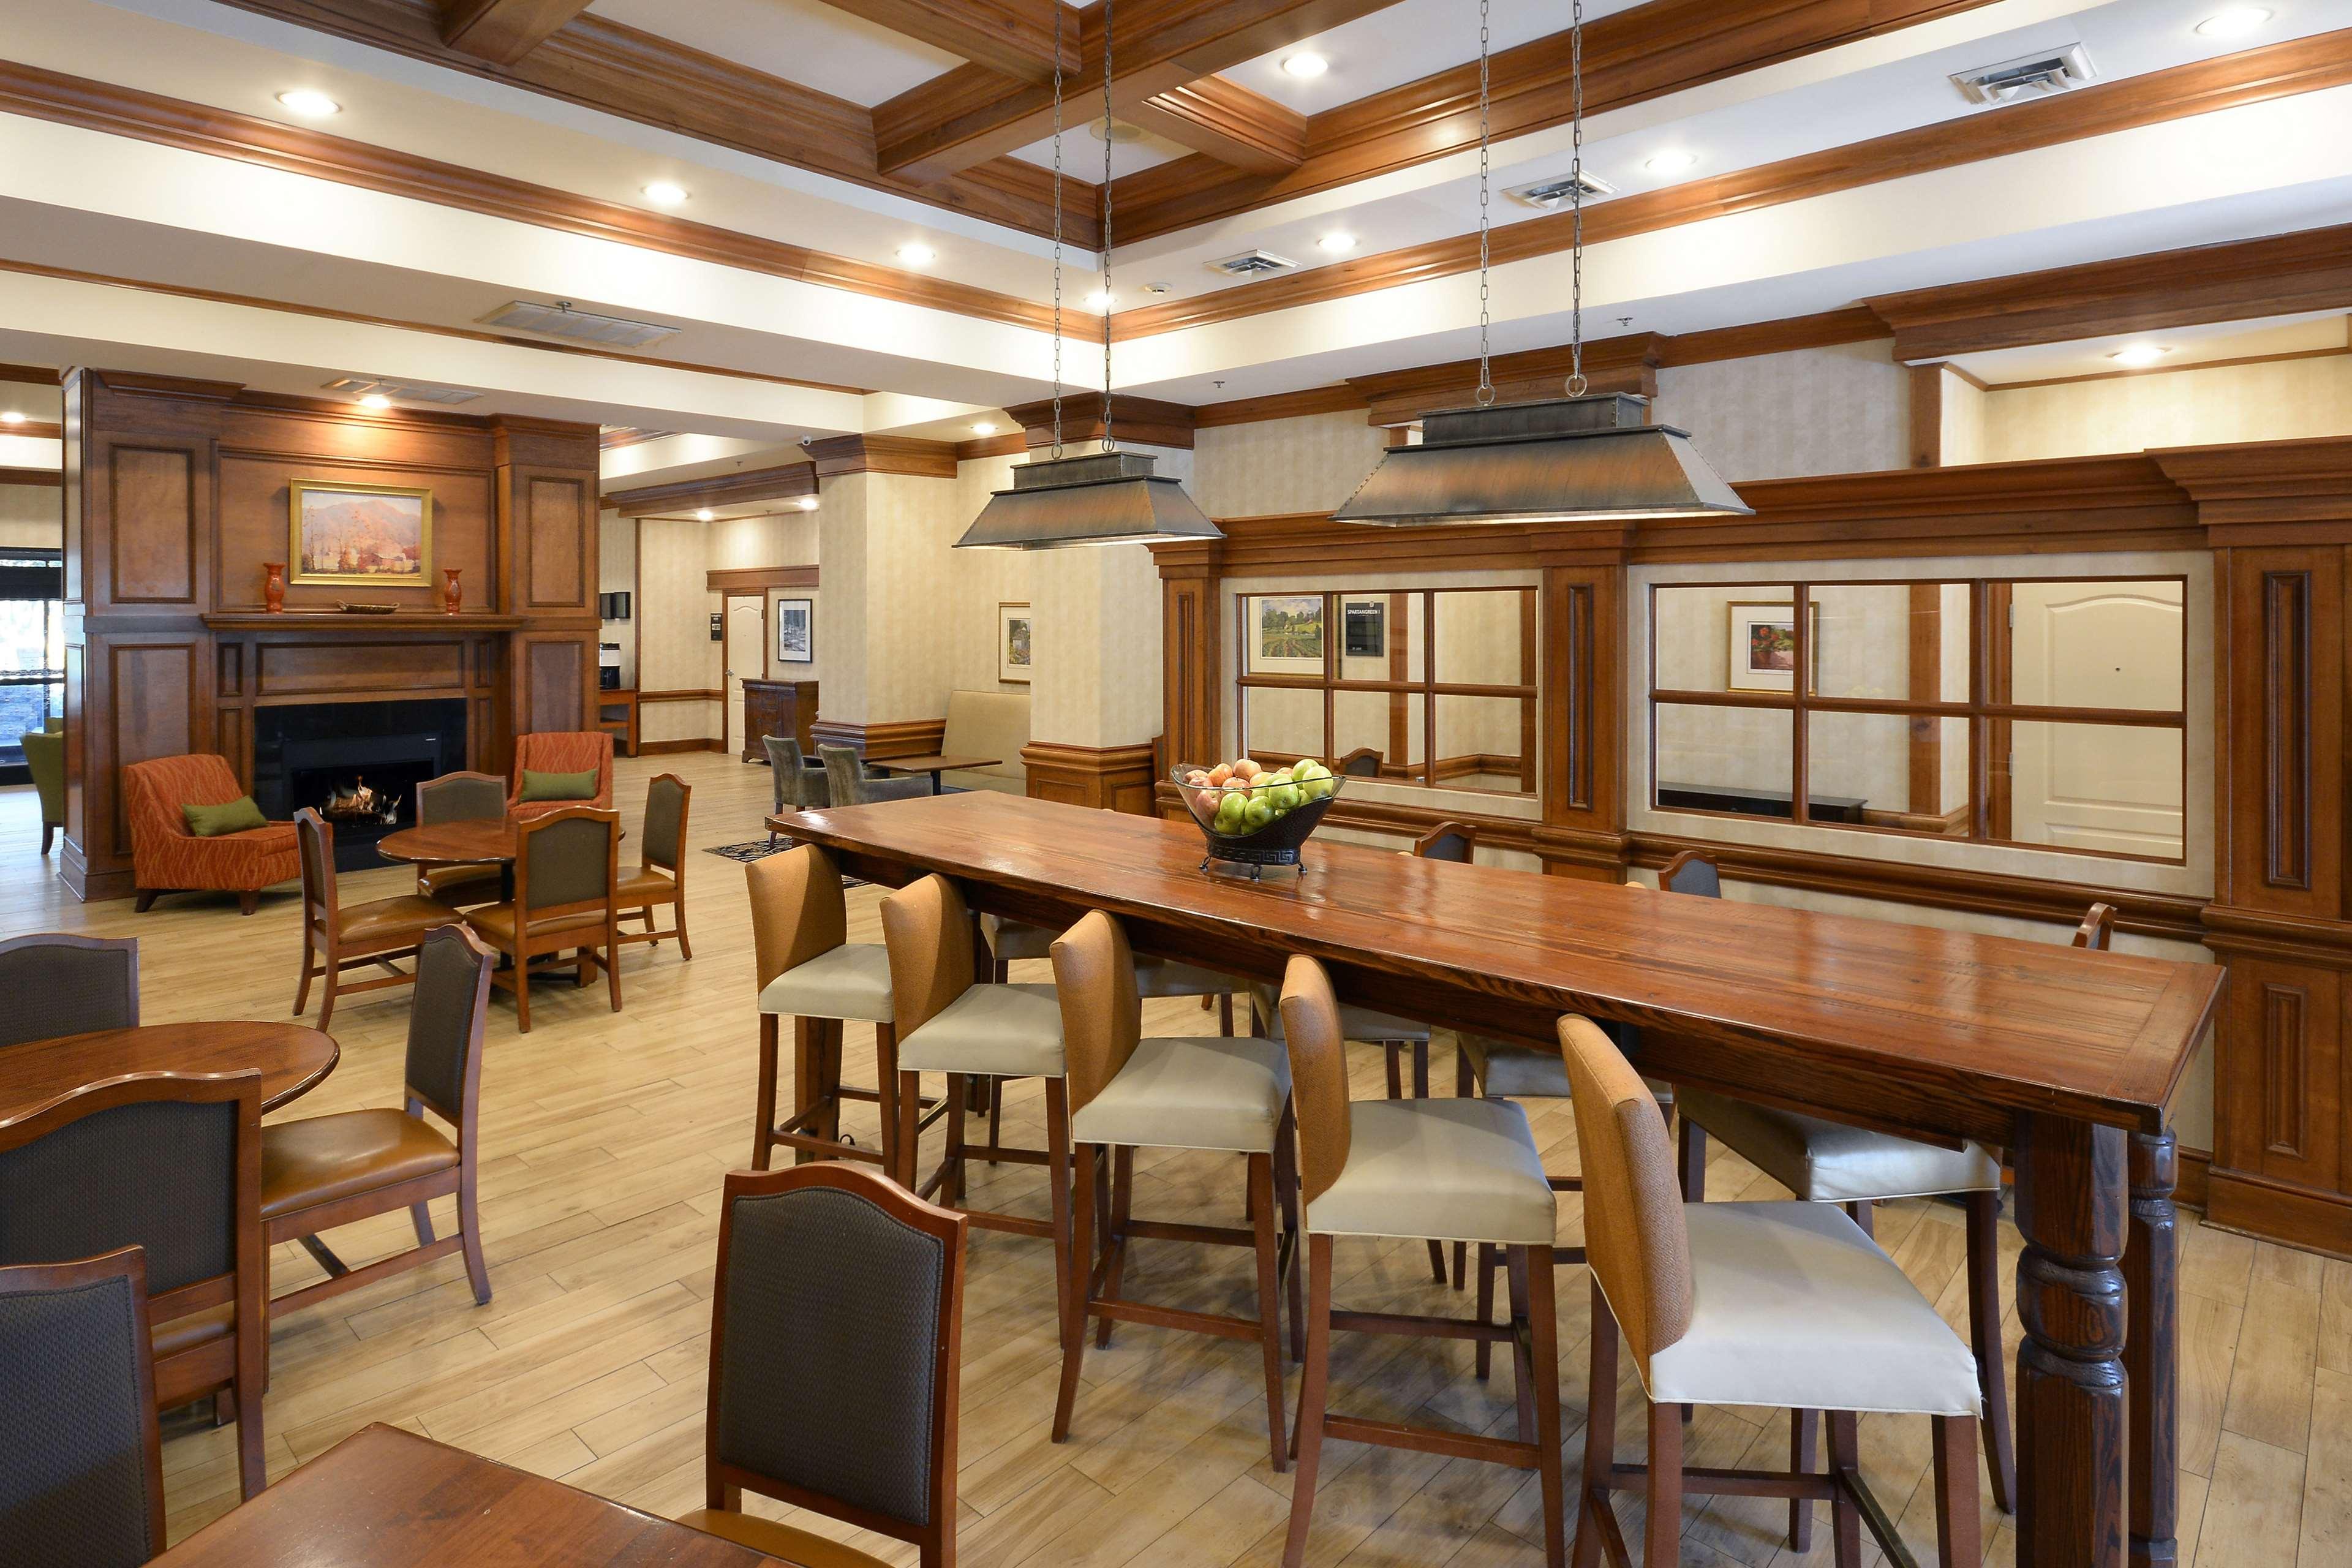 Hampton Inn & Suites Greenville/Spartanburg I-85 image 9